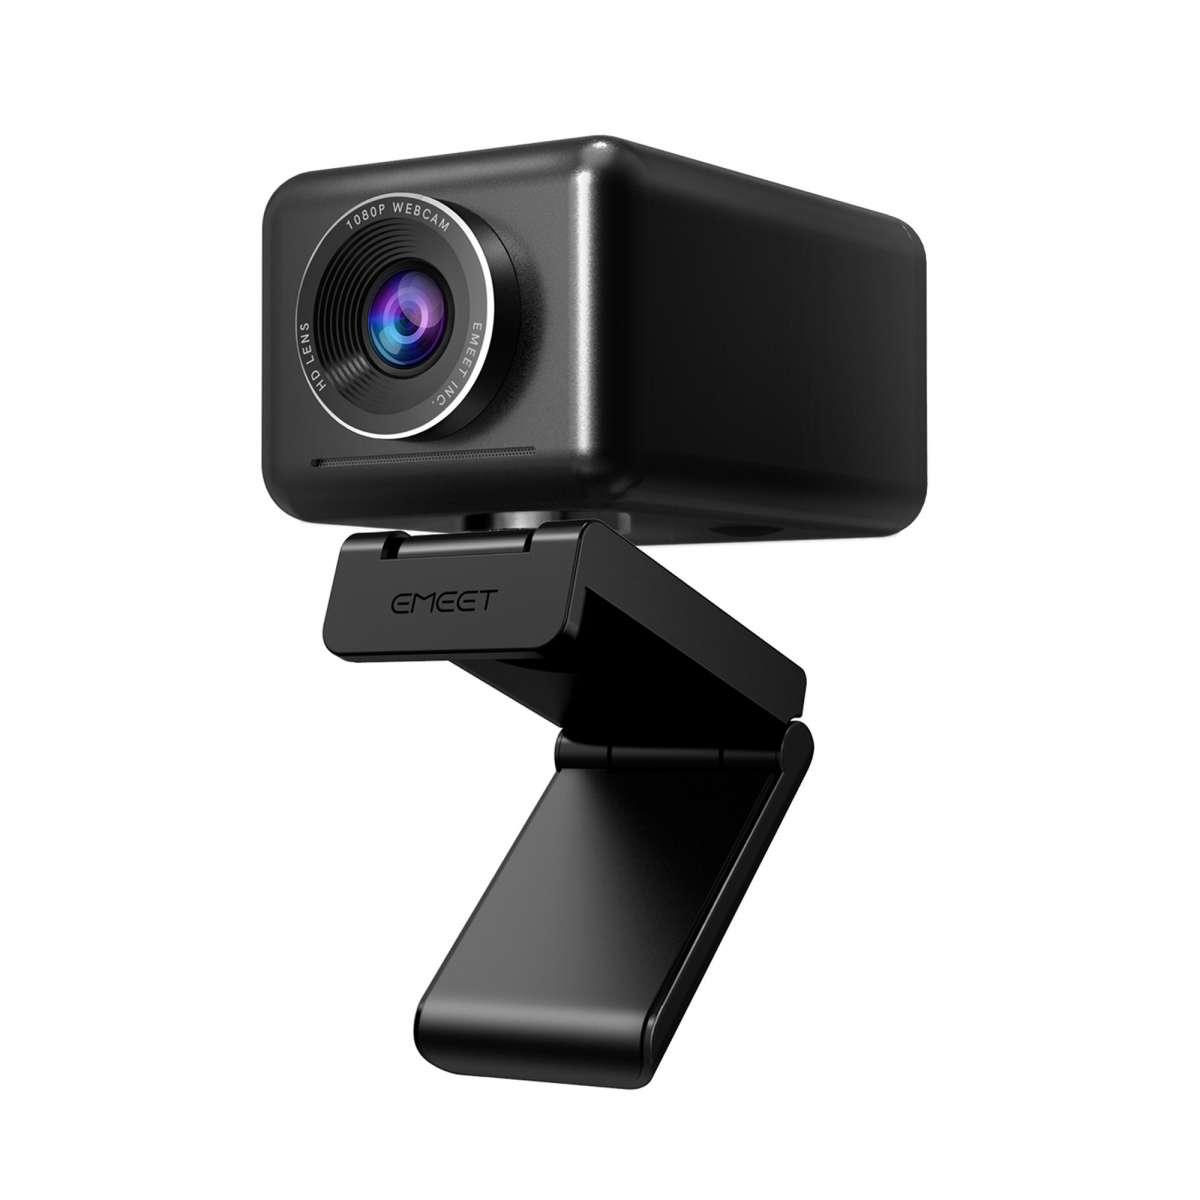 EMEET Jupiter 網路攝影機/視訊攝影機/監視器/電腦攝像頭|WitsPer智選家